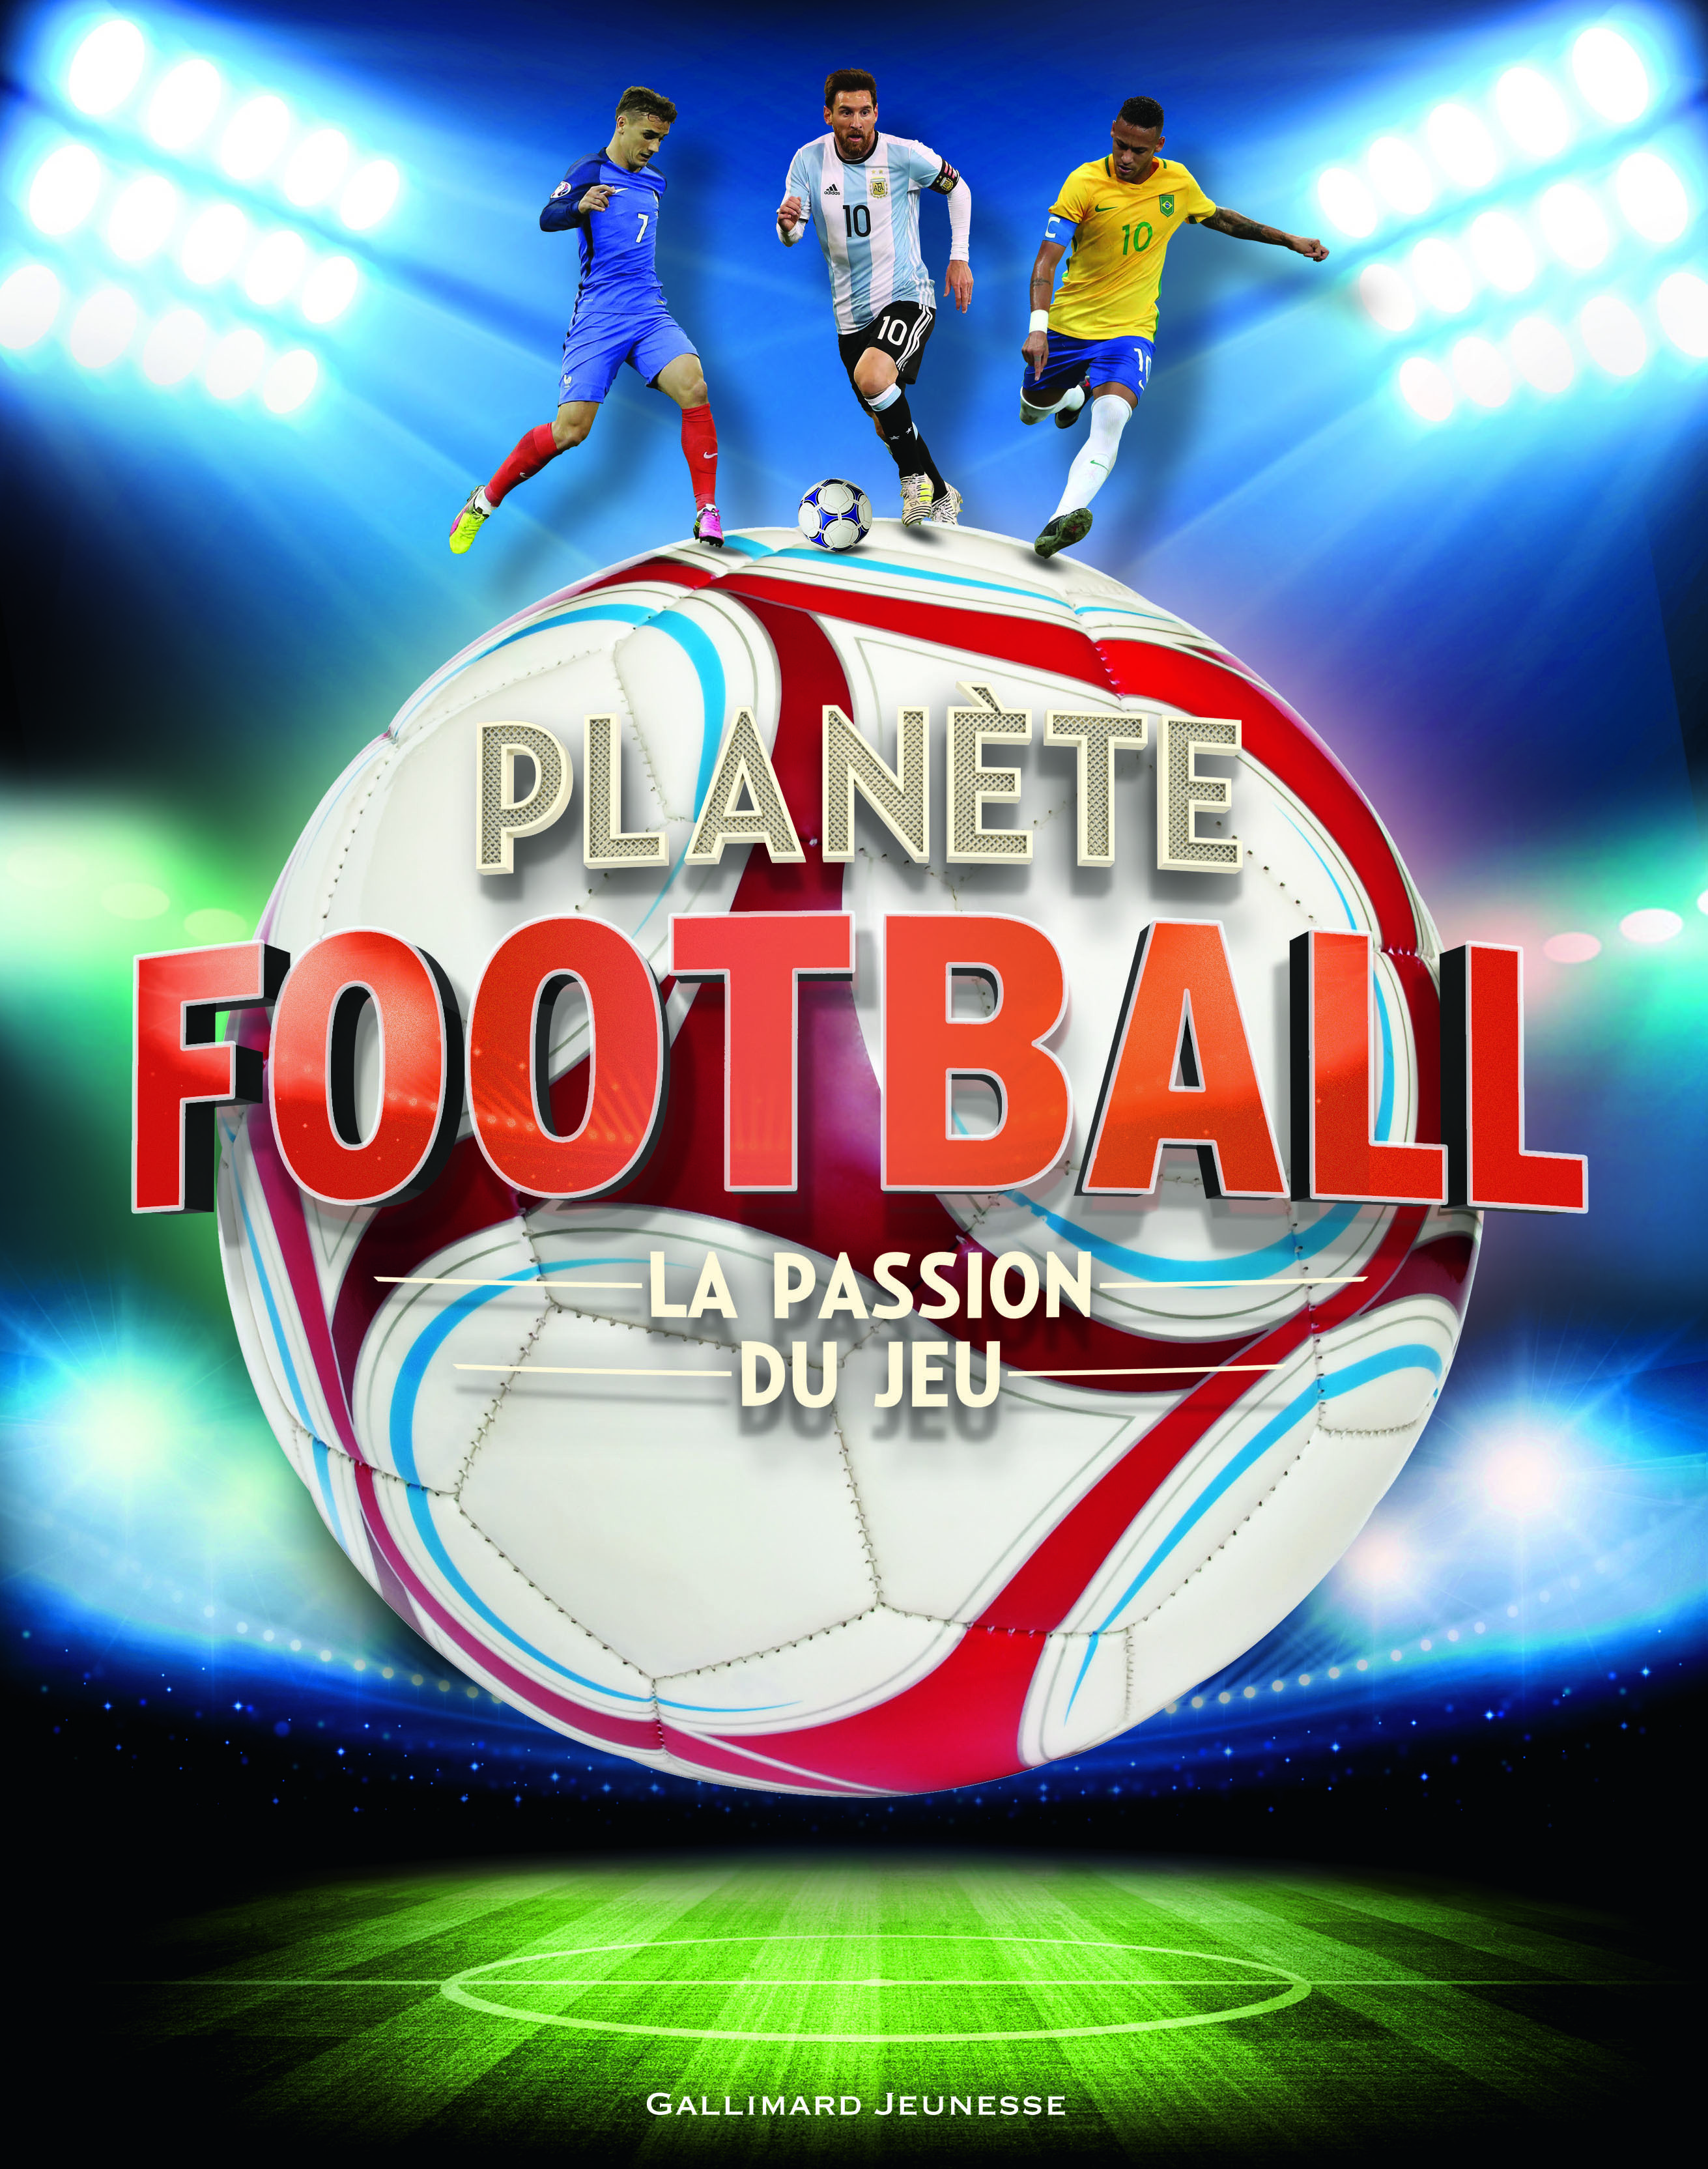 PLANETE FOOTBALL